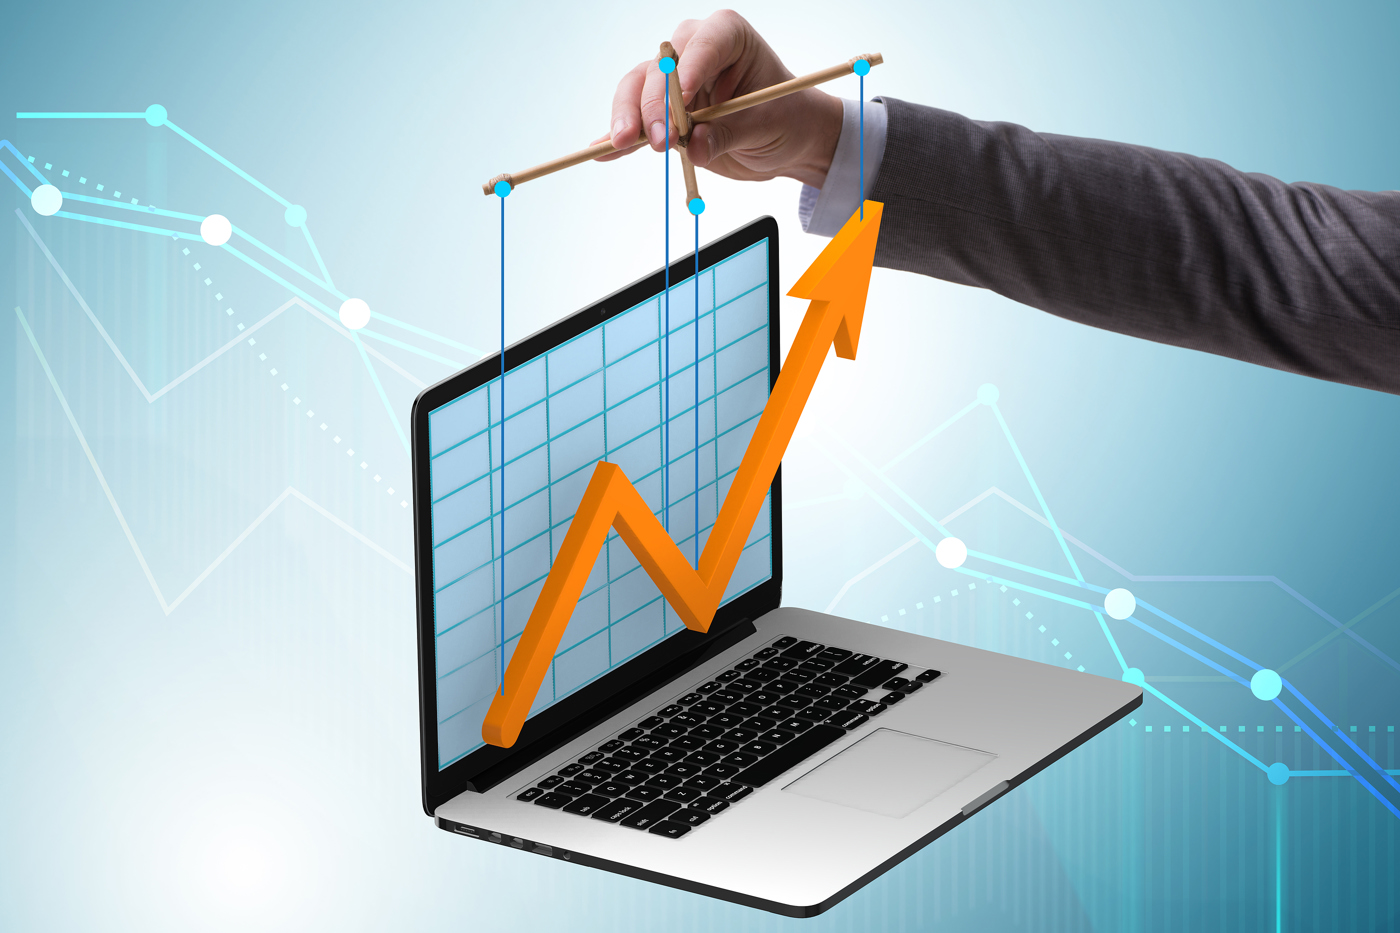 Analyst upgrade, Stock upgrade, Stock rating, Analyst news